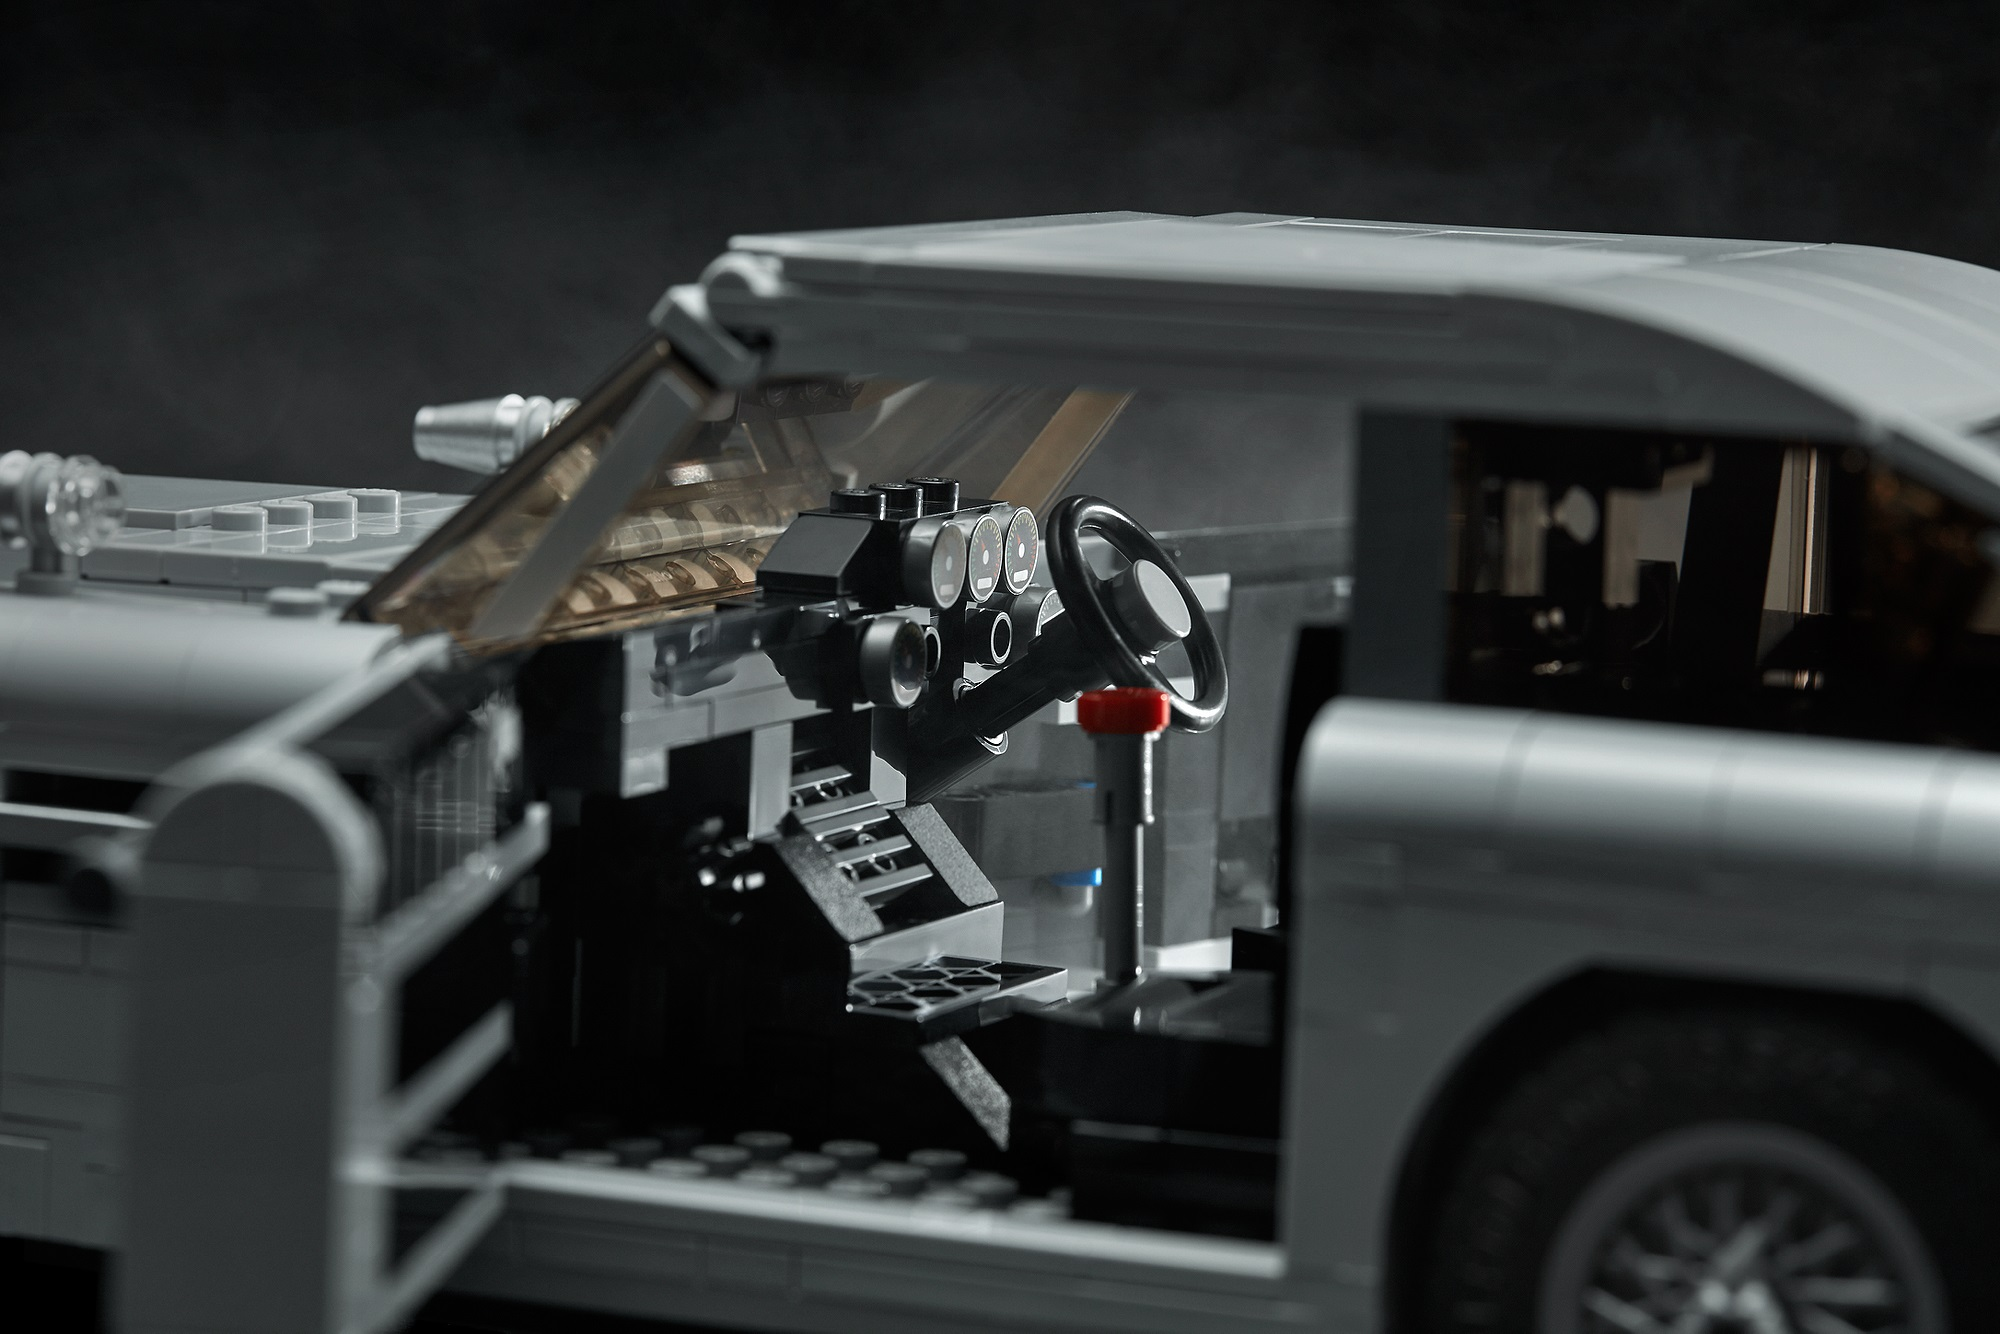 Thoughts On The New Lego 10262 James Bond Aston Martin Db5 Jay S Brick Blog